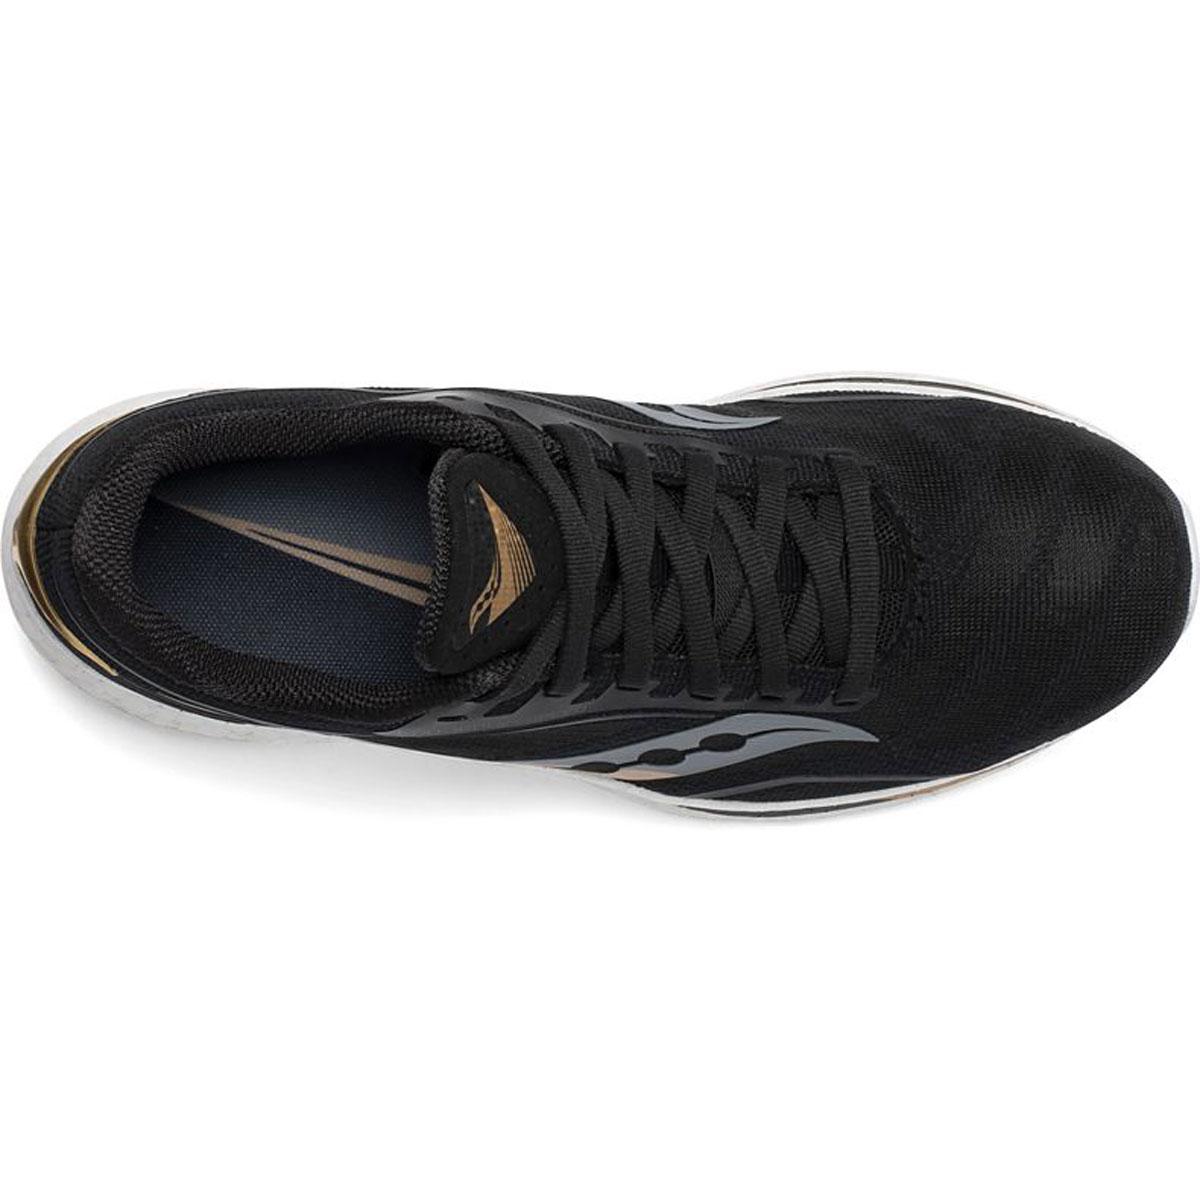 Women's Saucony Endorphin Speed Running Shoe - Color: Black/Gold - Size: 5 - Width: Regular, Black/Gold, large, image 3